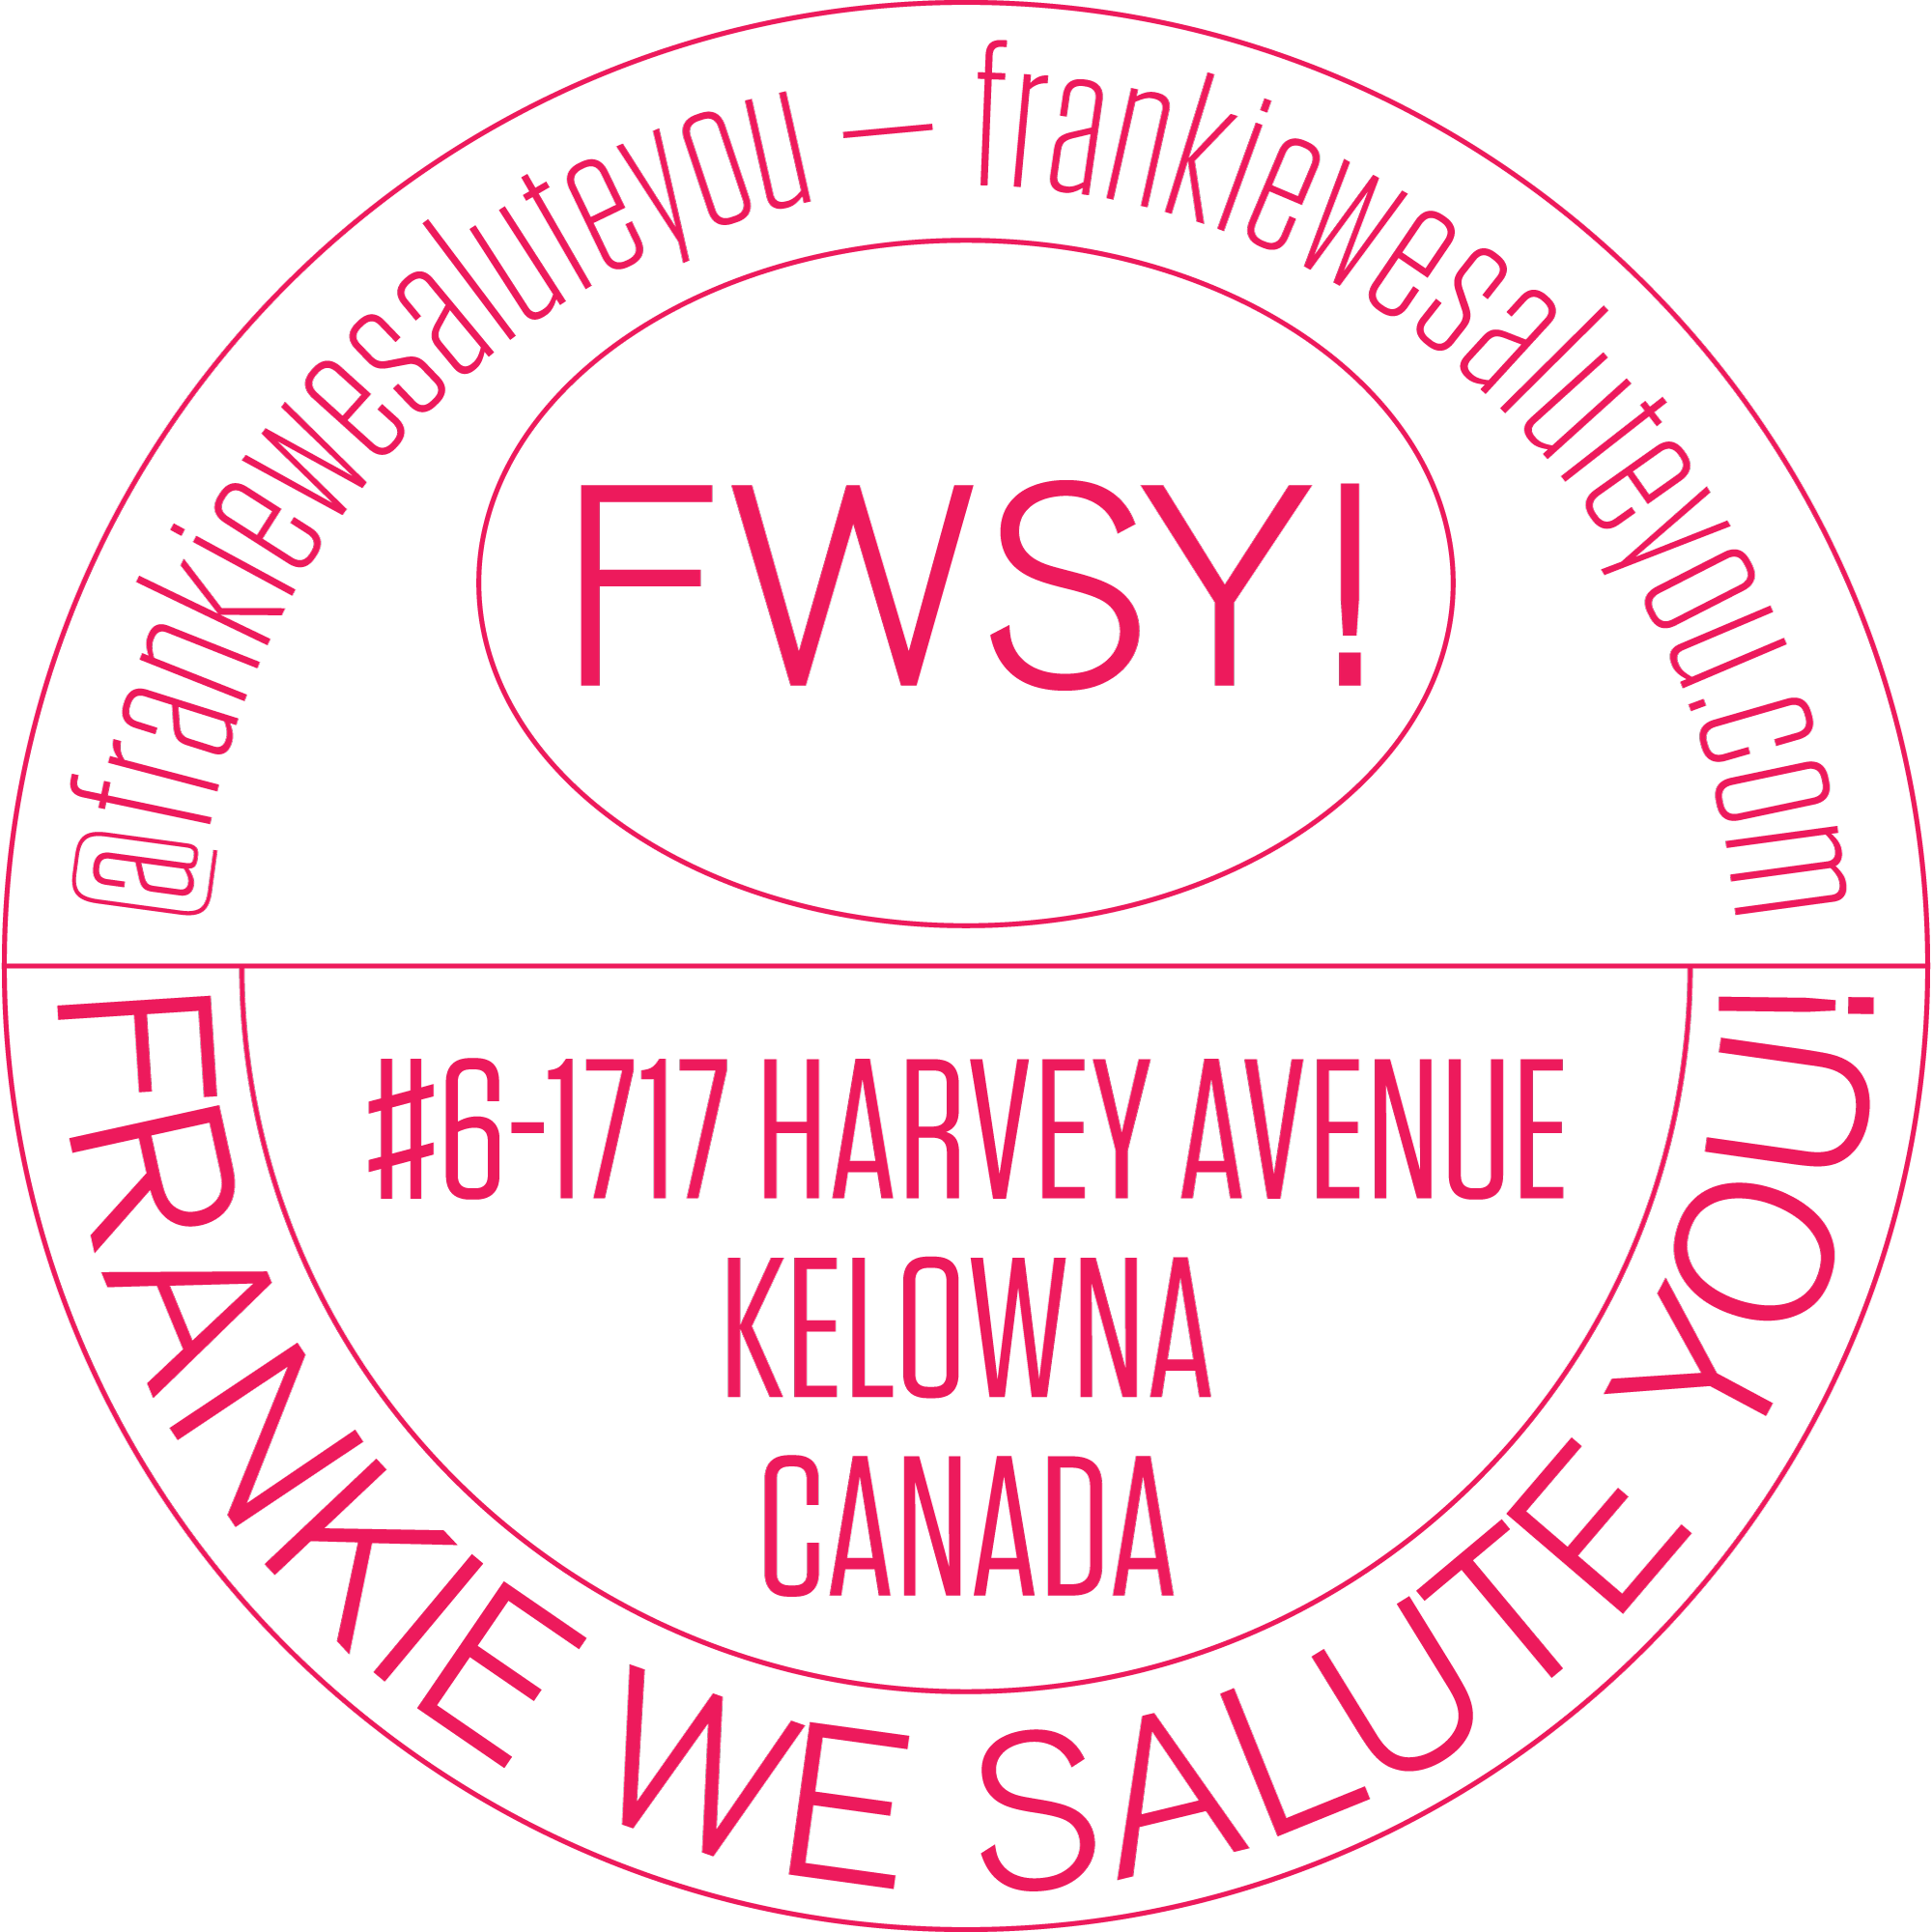 Frankie We Salute You